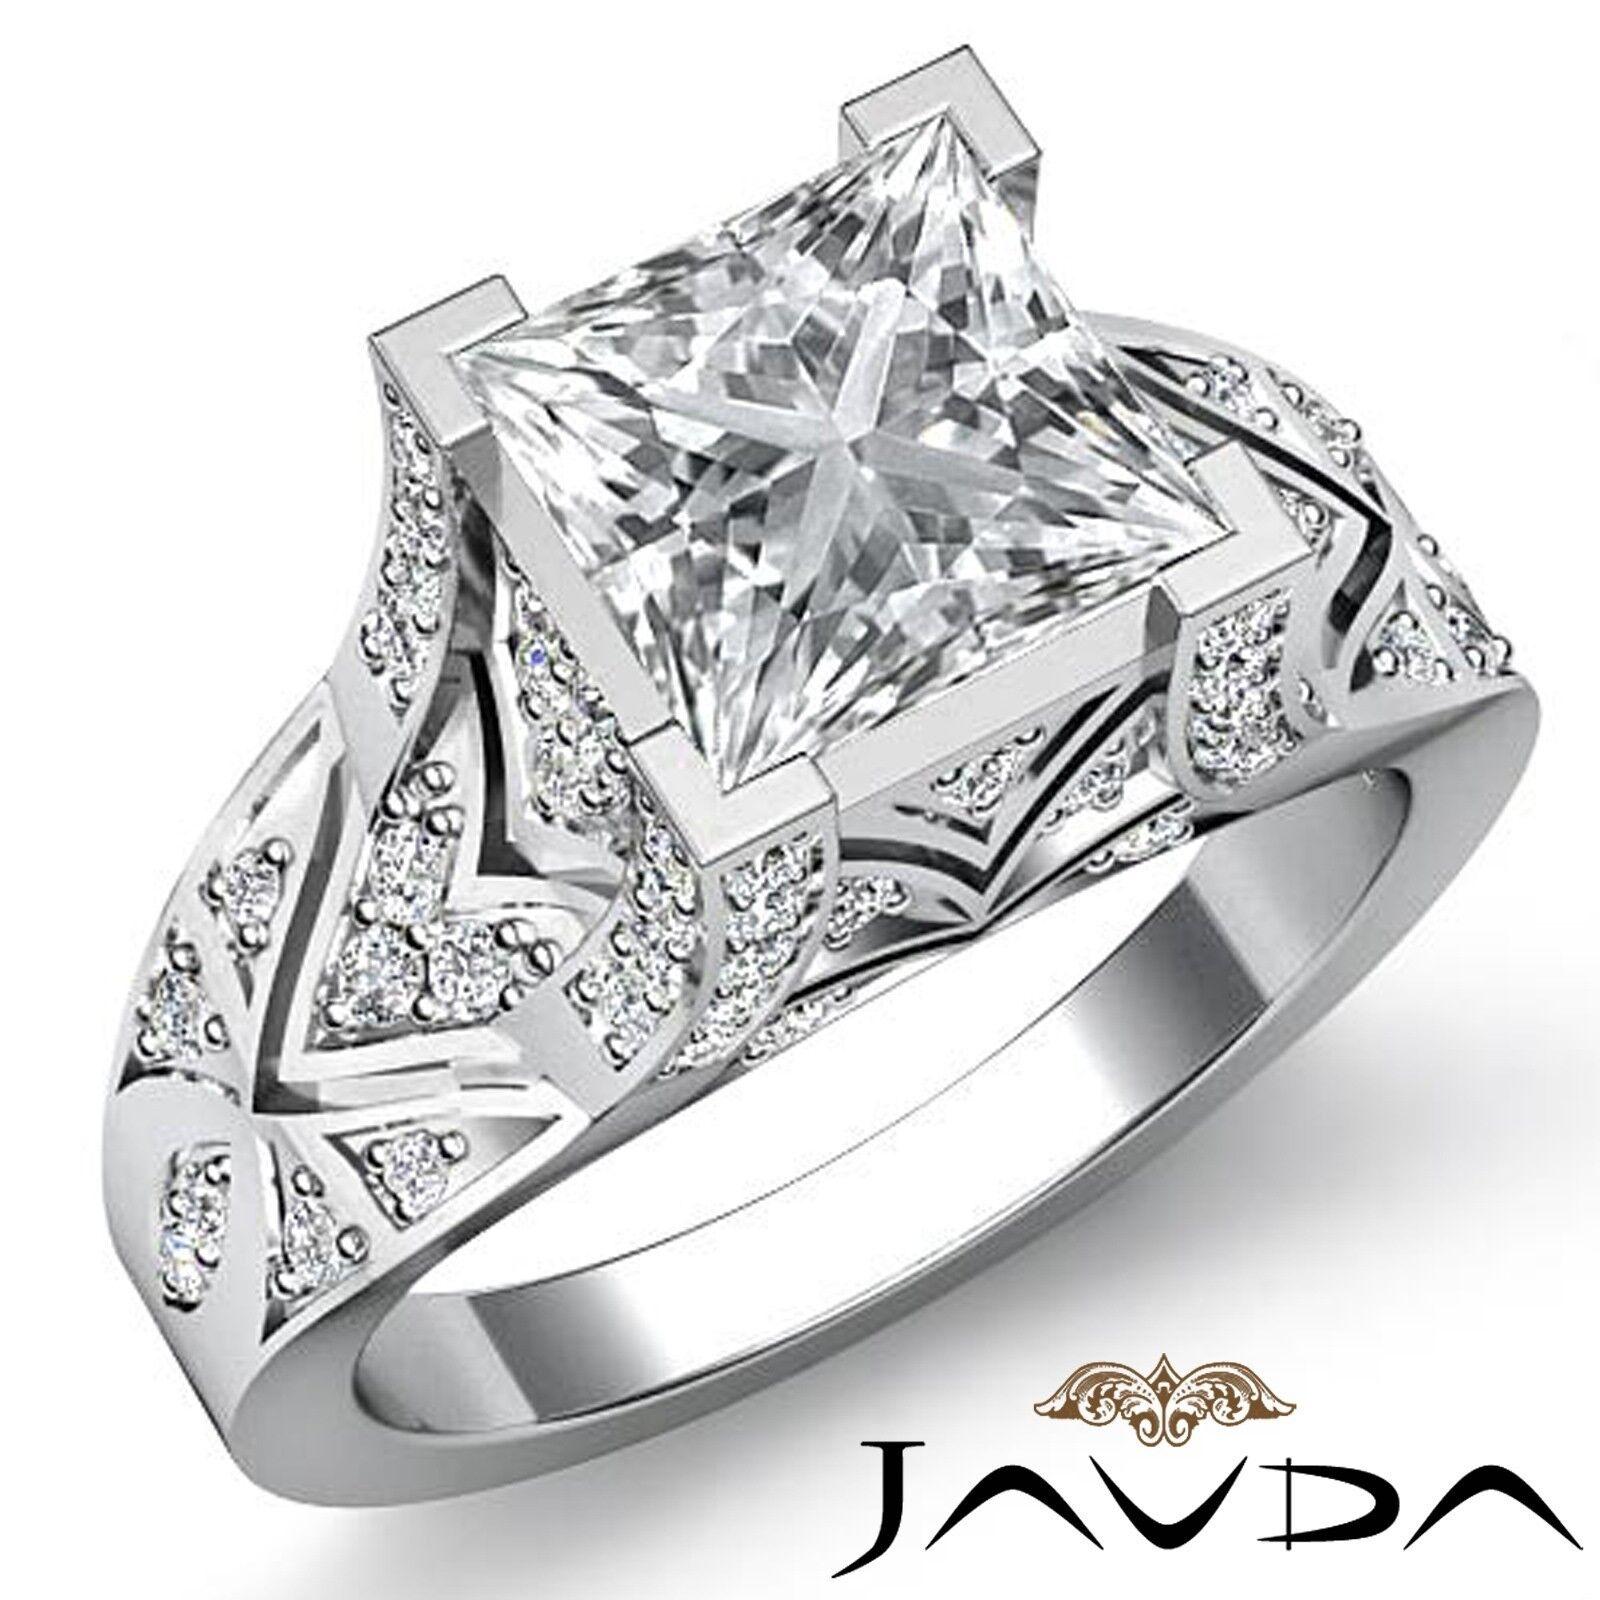 1.65ctw Antique Pave Princess Diamond  Engagement Ring GIA L-SI1 White Gold